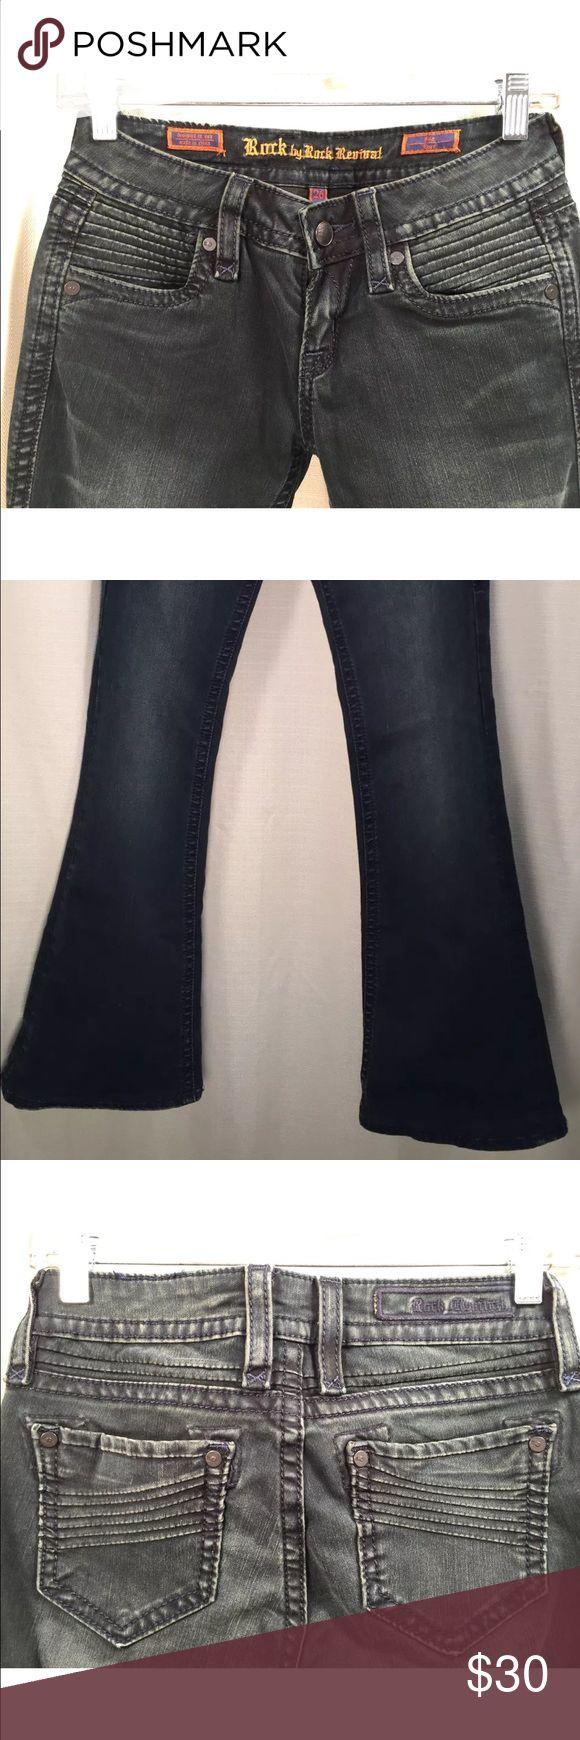 "Rock Revival Black Women's Jeans Size 26*30 L 38"" Rock Revival Black Women's Jeans Size 26*30 L 38"". These jeans were sewn. Rock Revival Jeans"